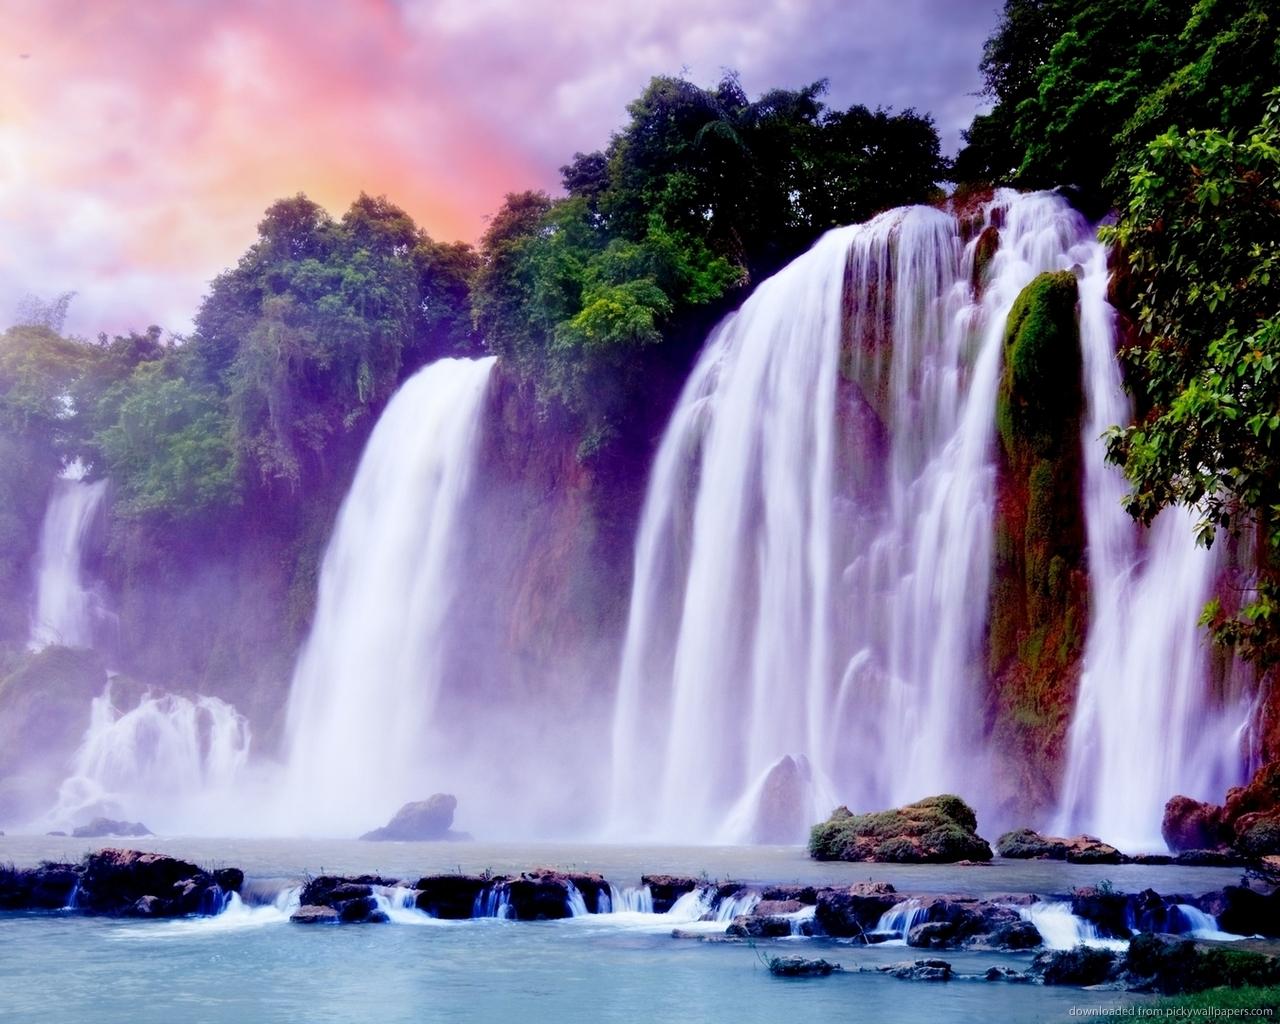 High Resolution Wallpaper | Ban Gioc–Detian Falls 1280x1024 px